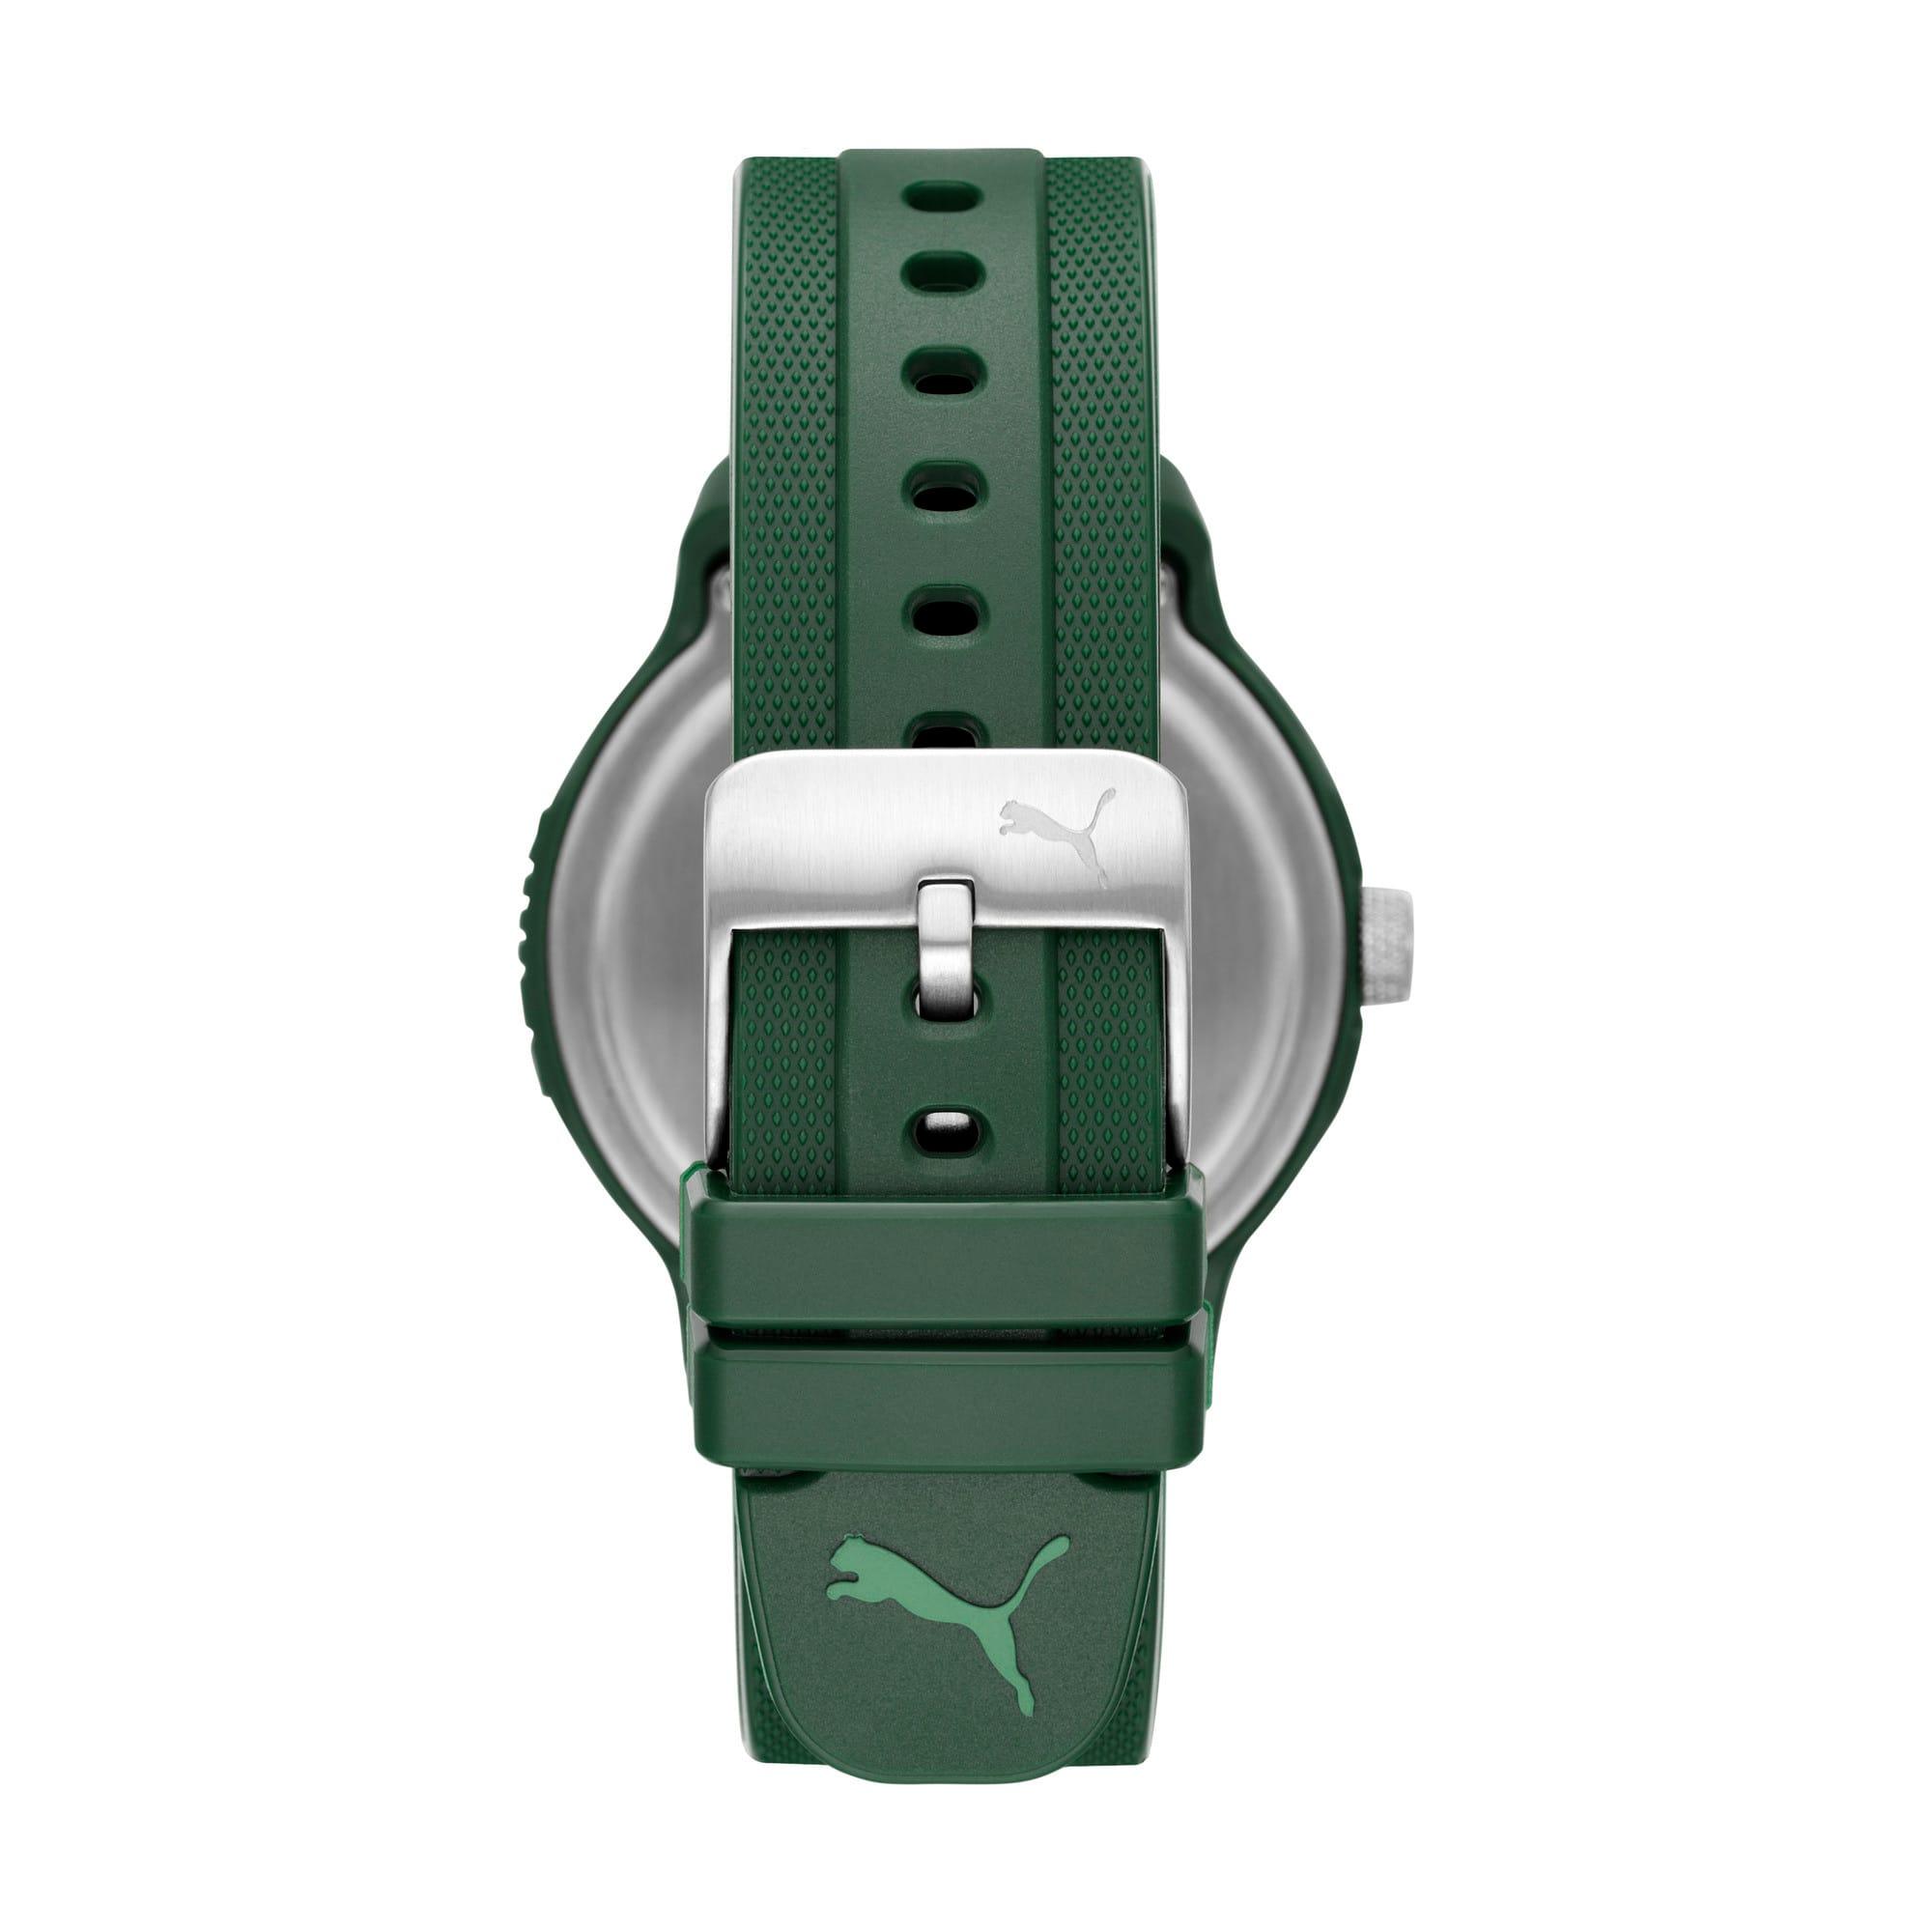 Thumbnail 3 of Reset v2 Watch, Green/Green, medium